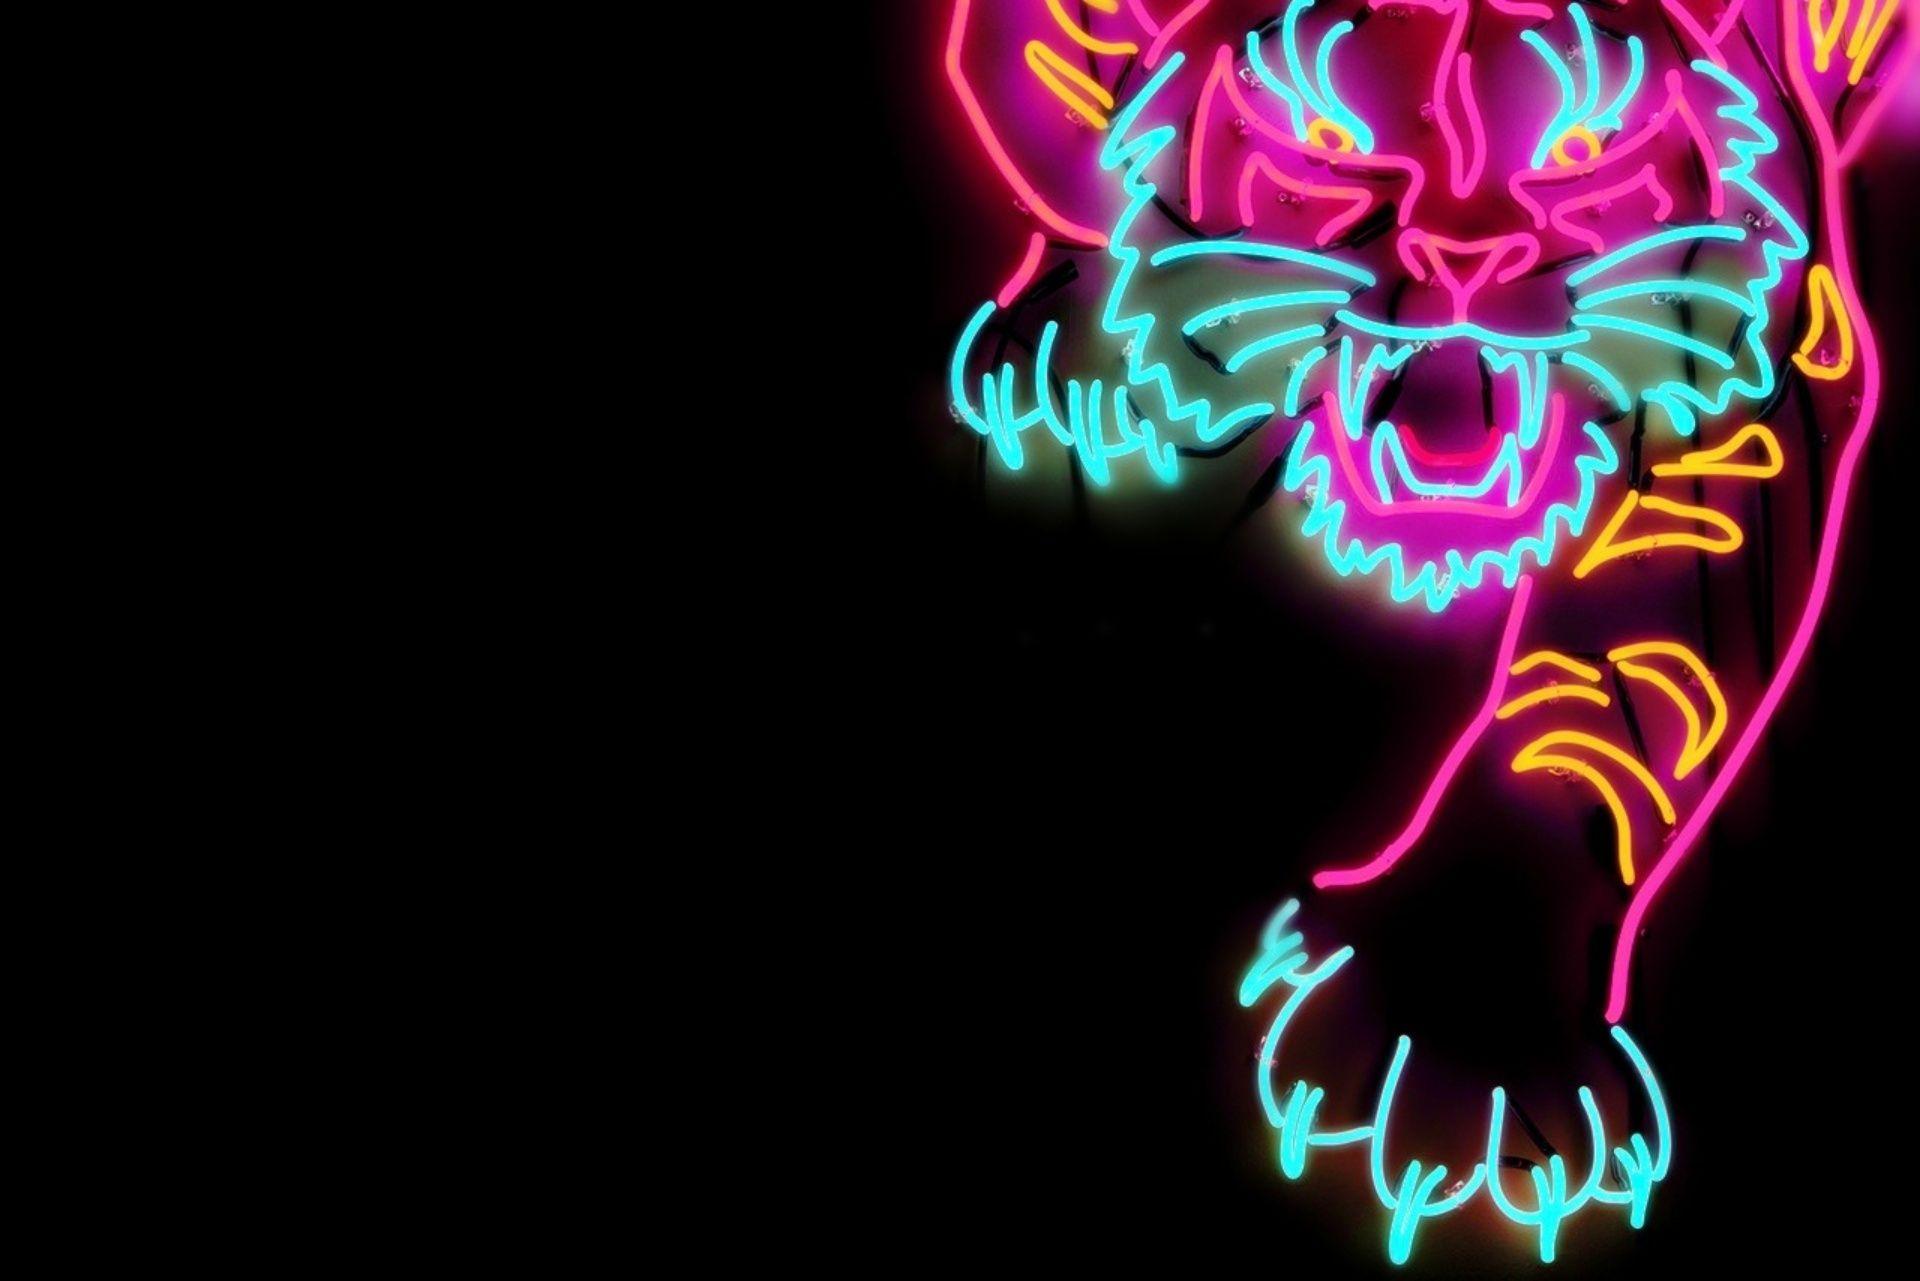 Neon Tiger Wallpapers - Wallpaper Cave